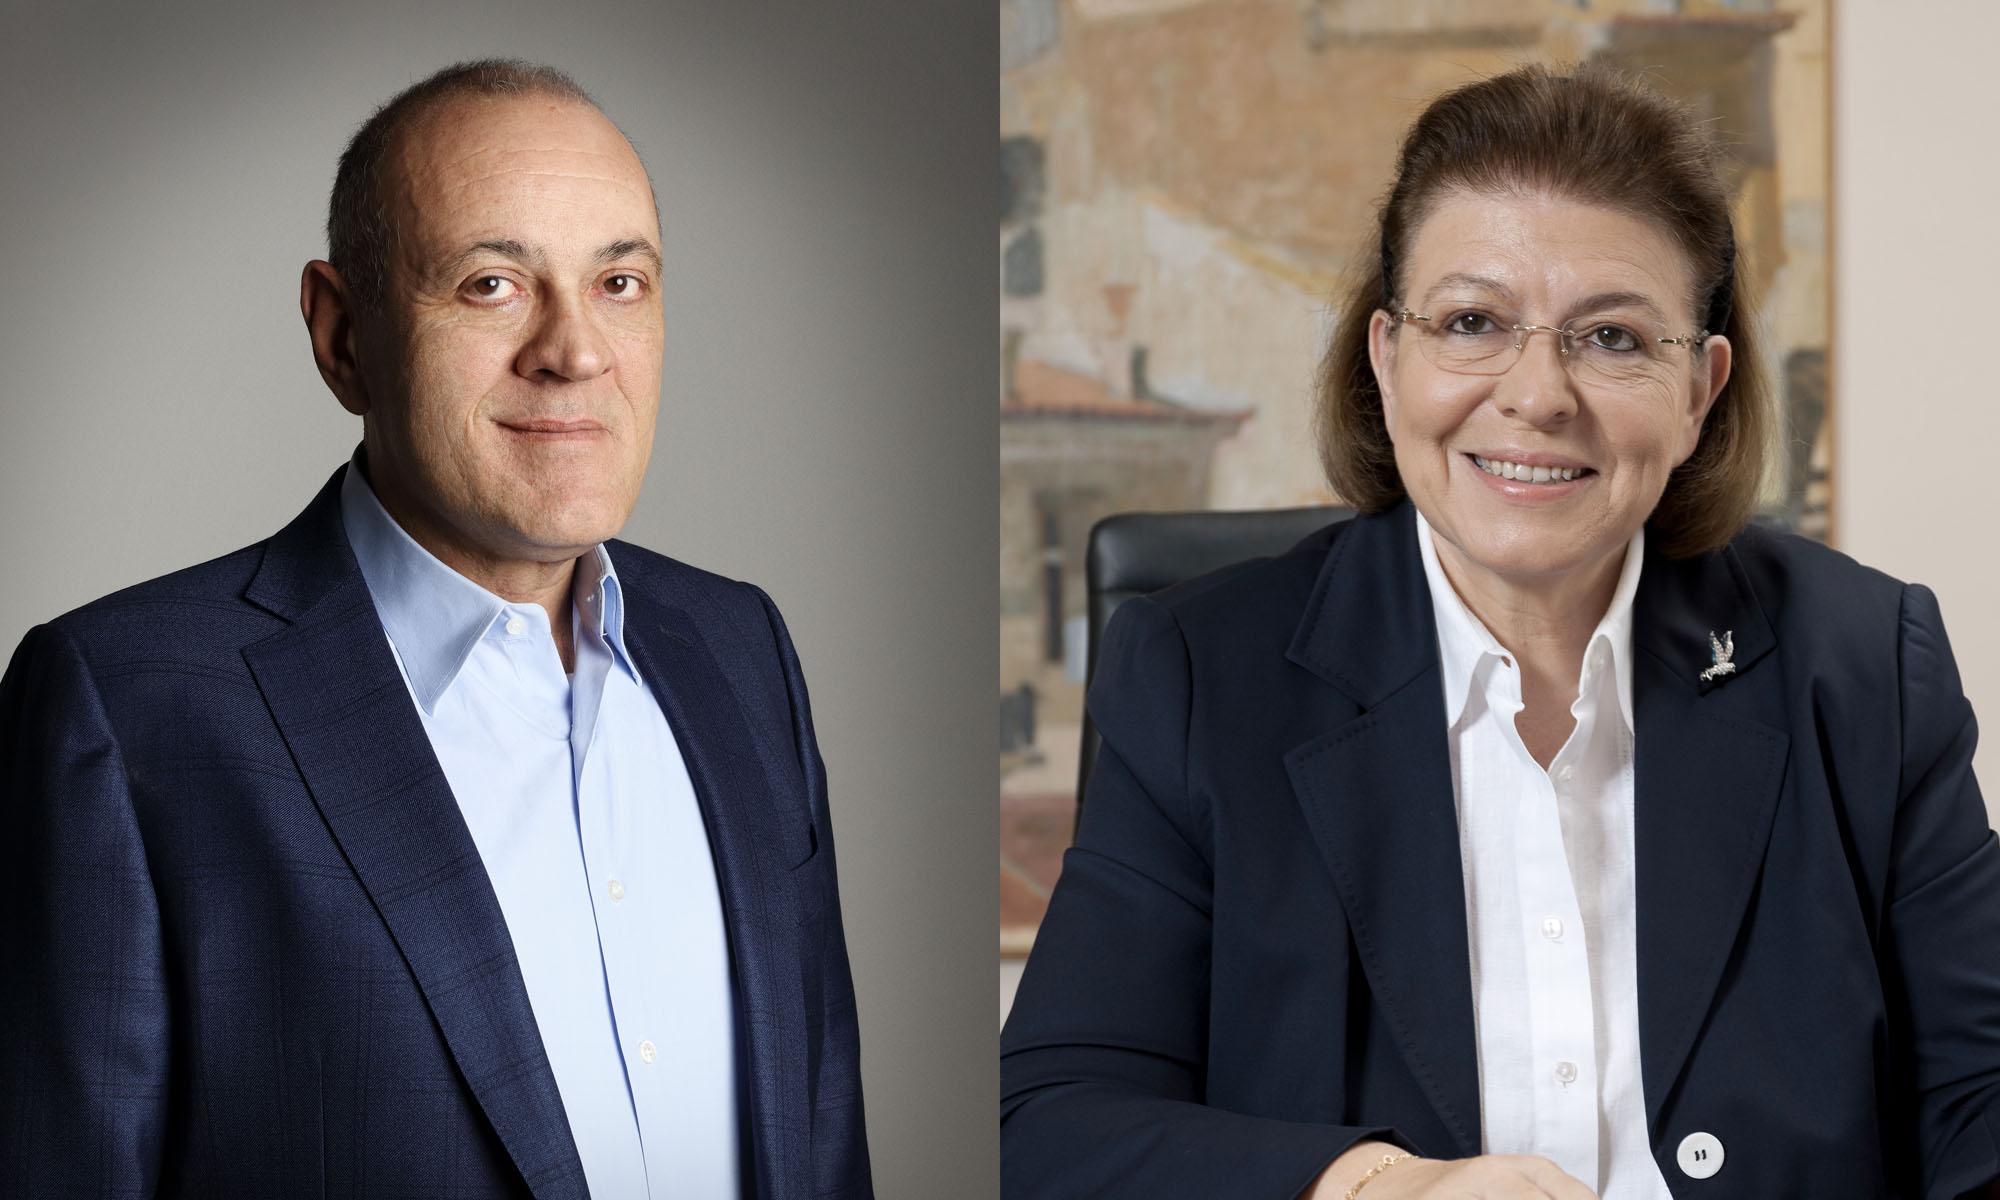 NEON TALKS | LINA MENDONI & DIMITRIS DASKALOPOULOS